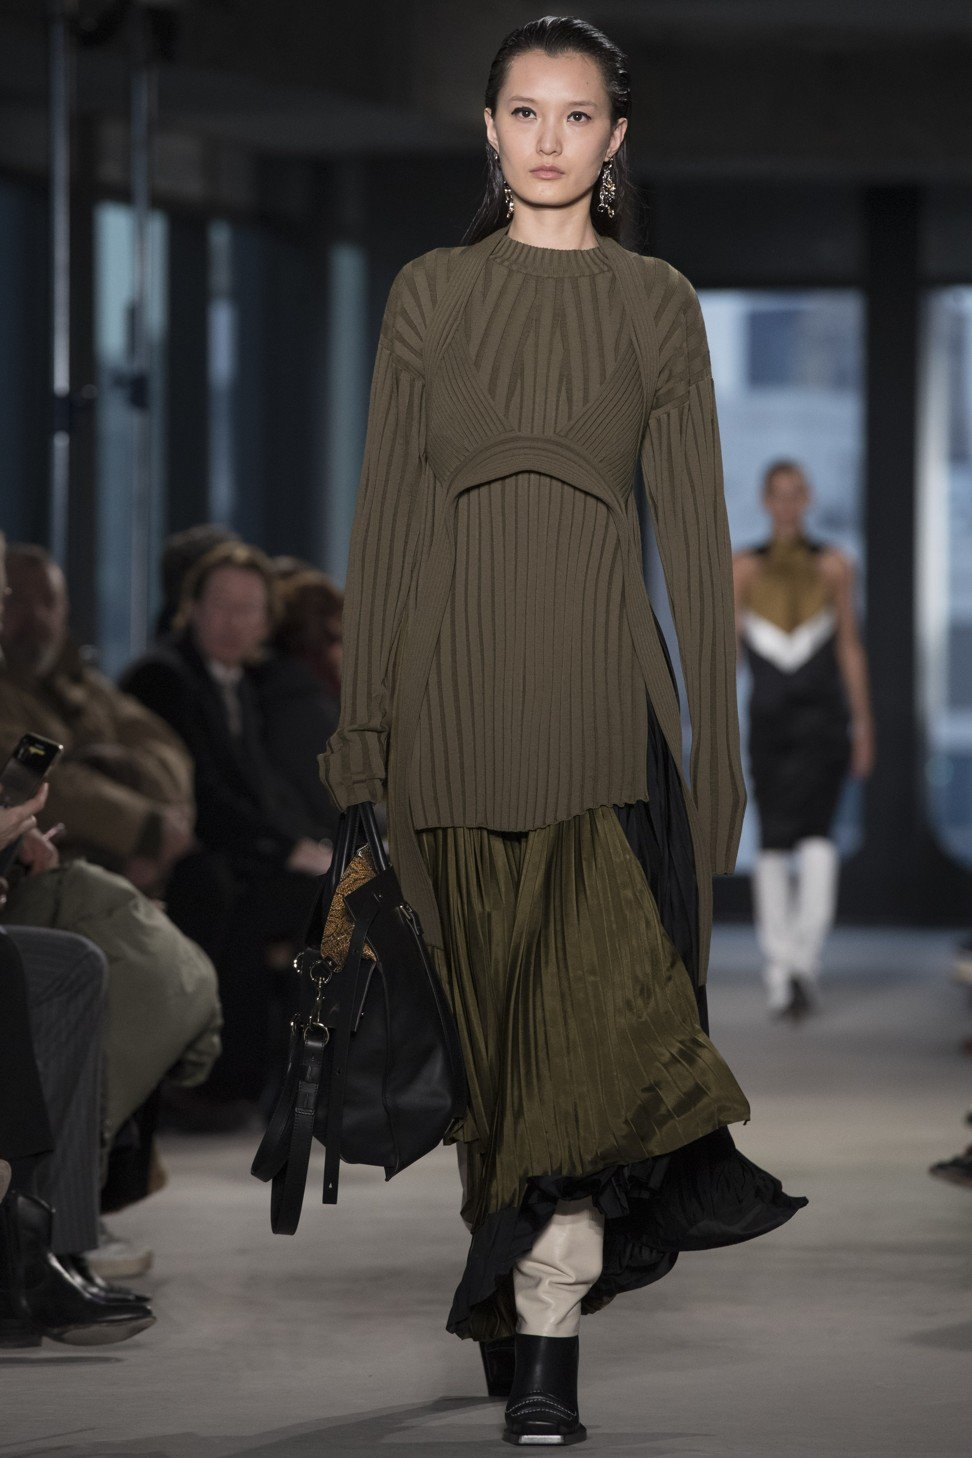 2434b52baa22 New York Fashion Week  Proenza Schouler designers go back to basics after  Paris stint